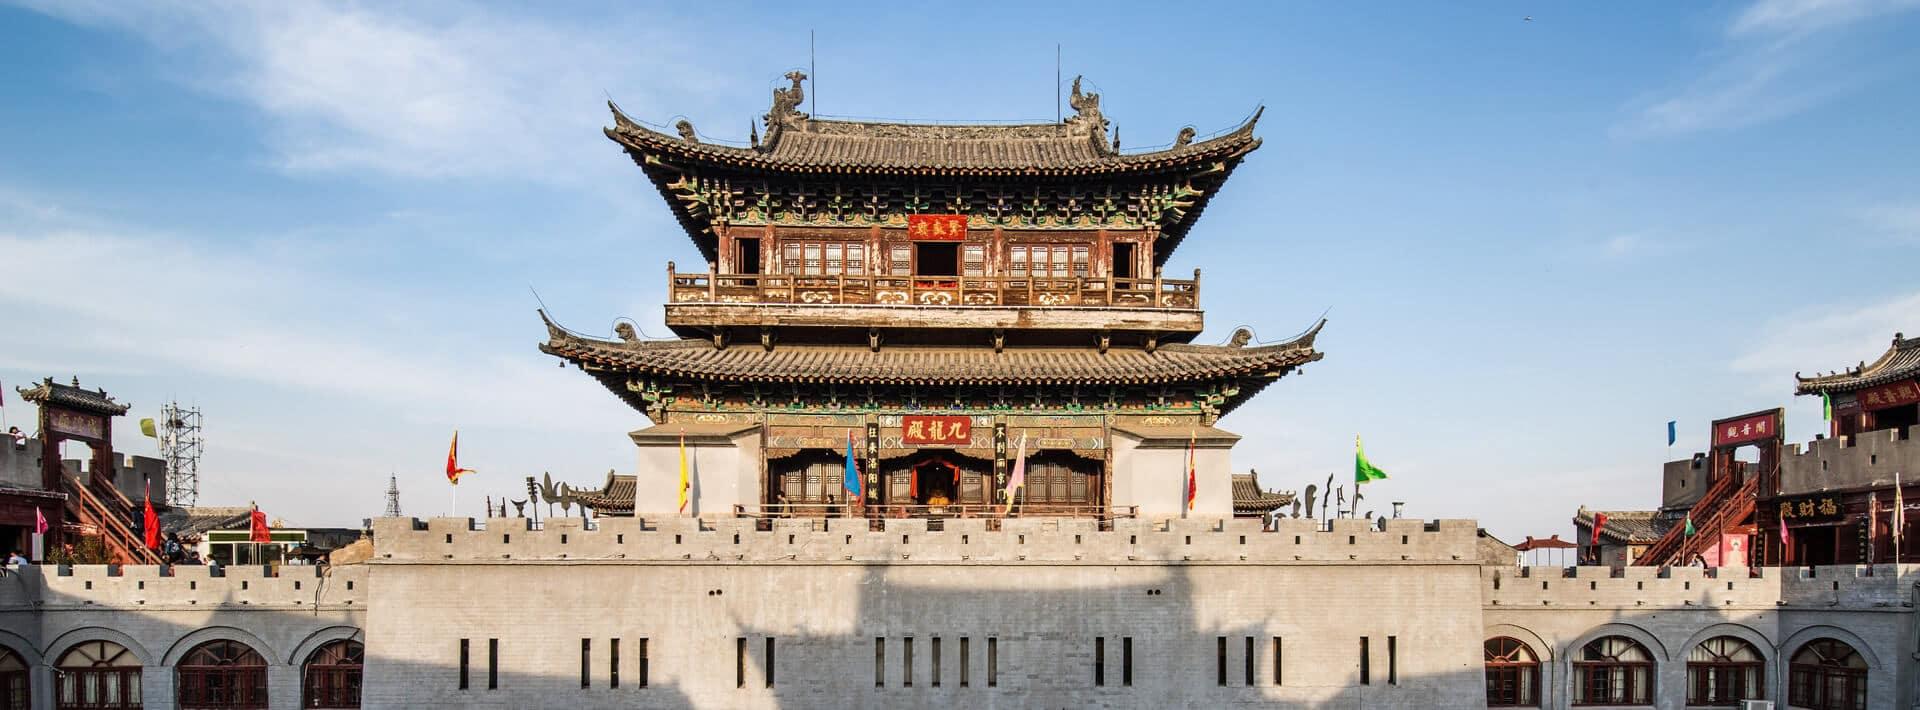 Luoyang Ciel Chine